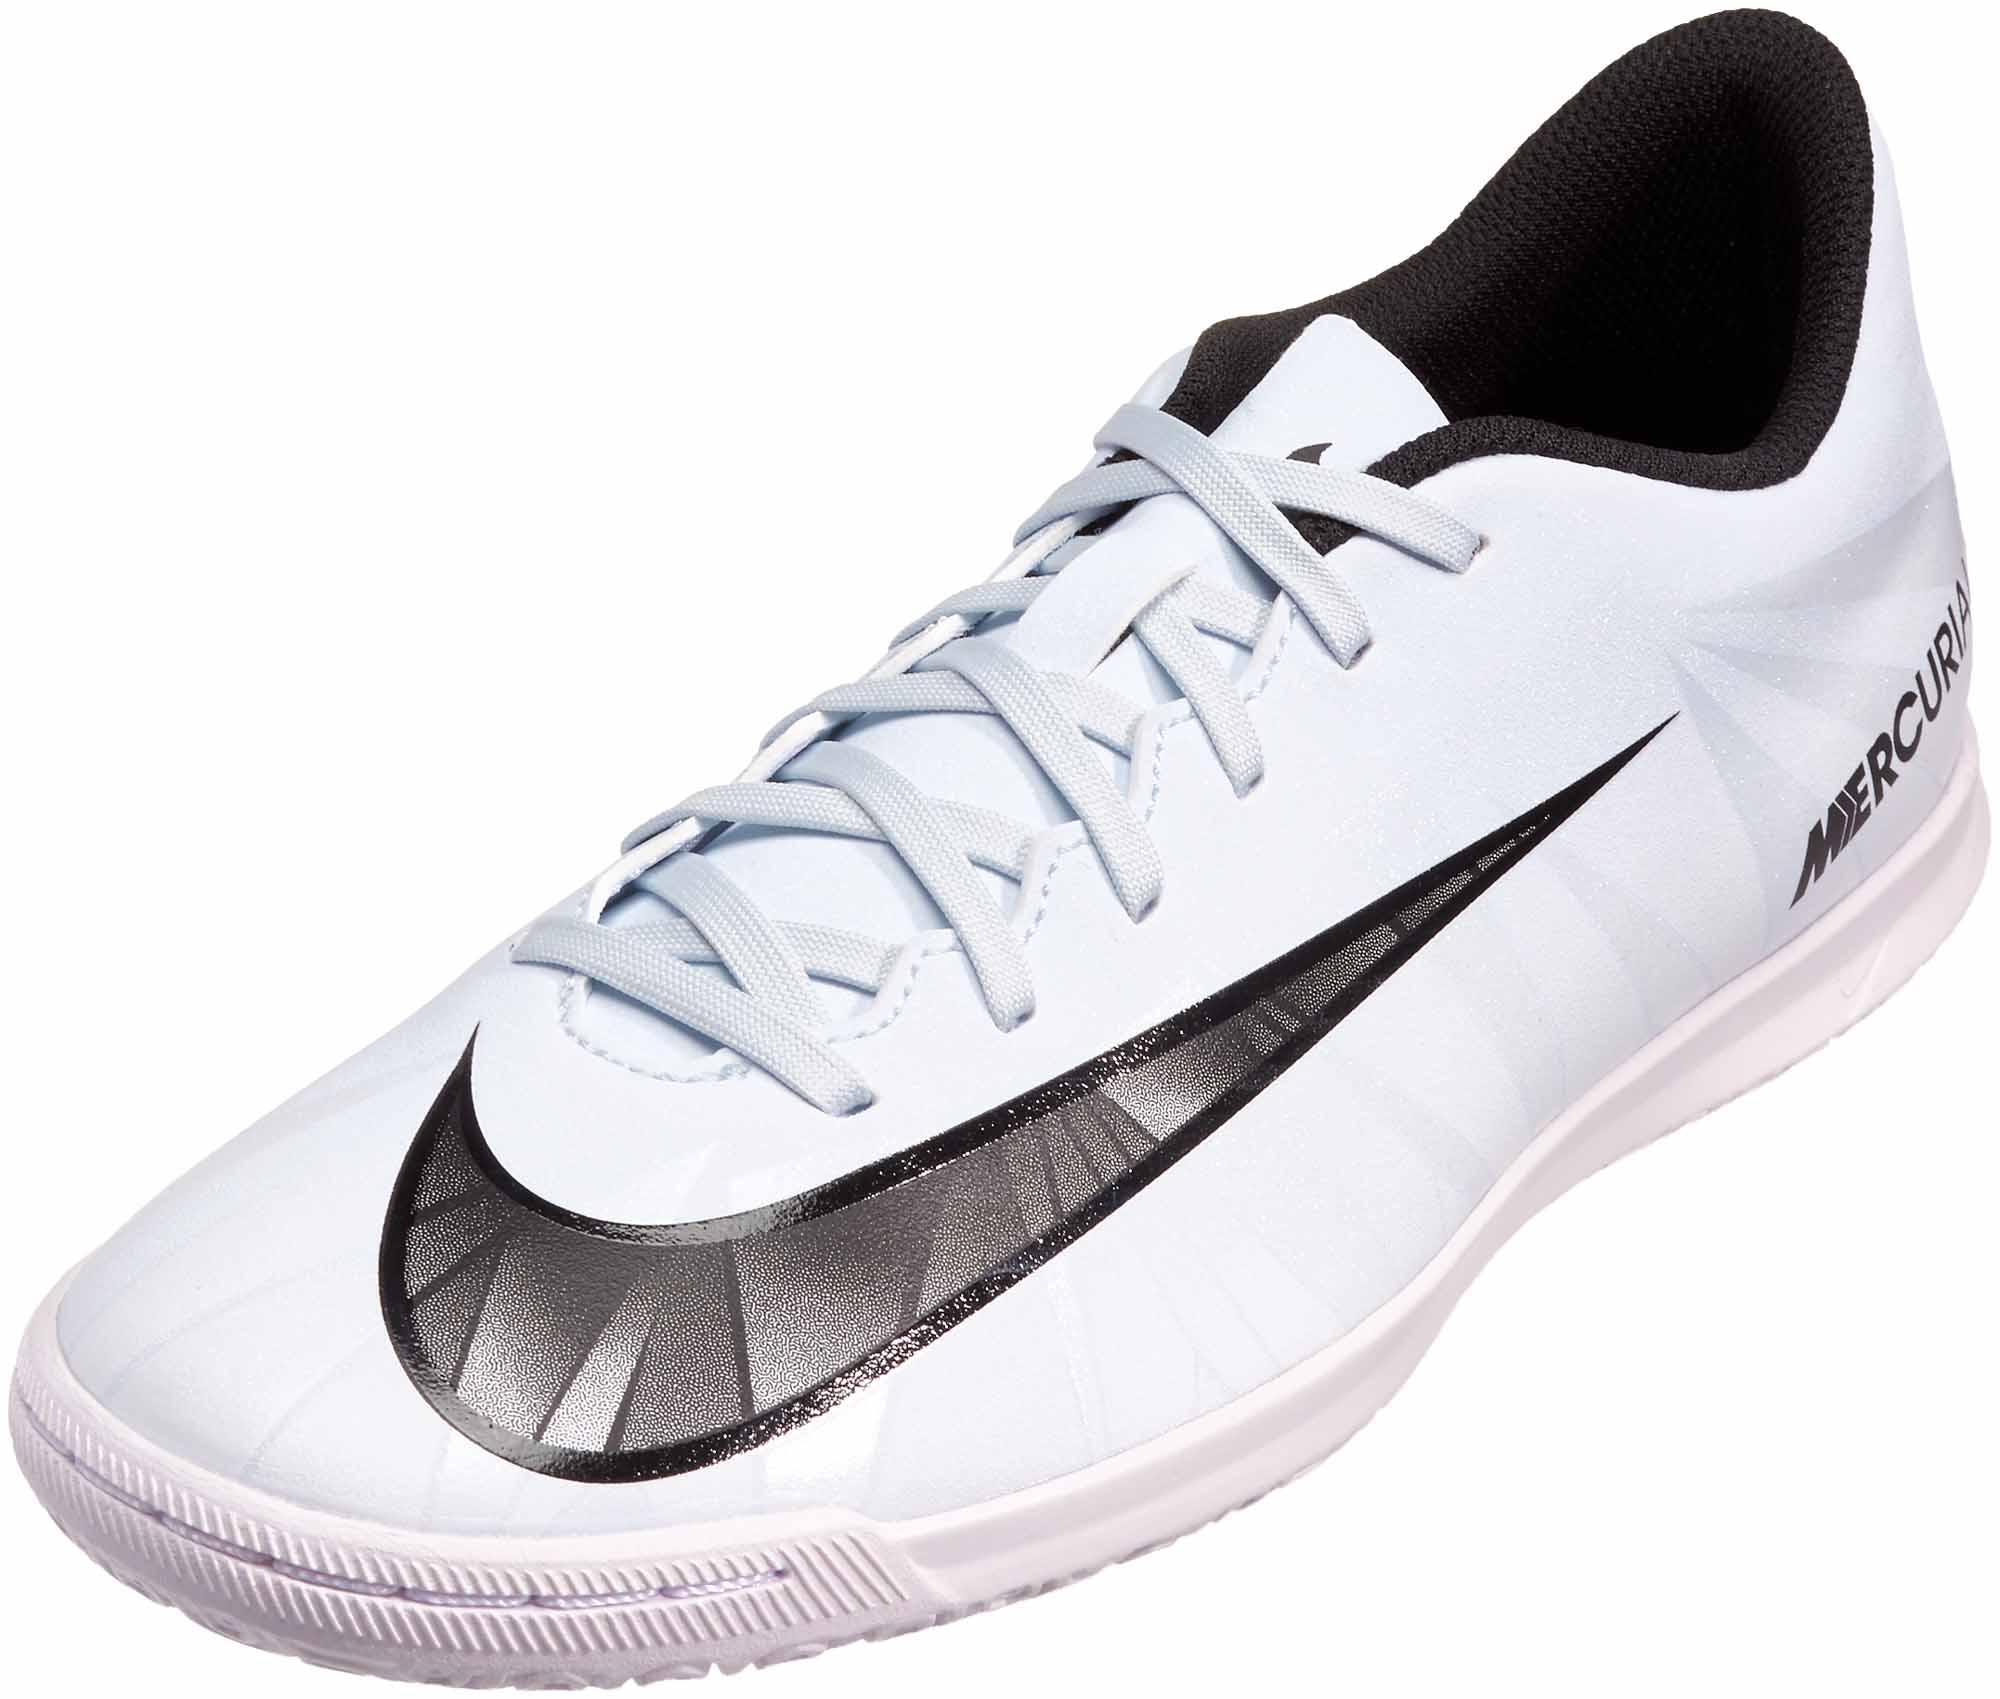 4fc40d5a5f47 Nike MercurialX Vortex III IC - CR7 - Blue Tint   Black - Soccer Master